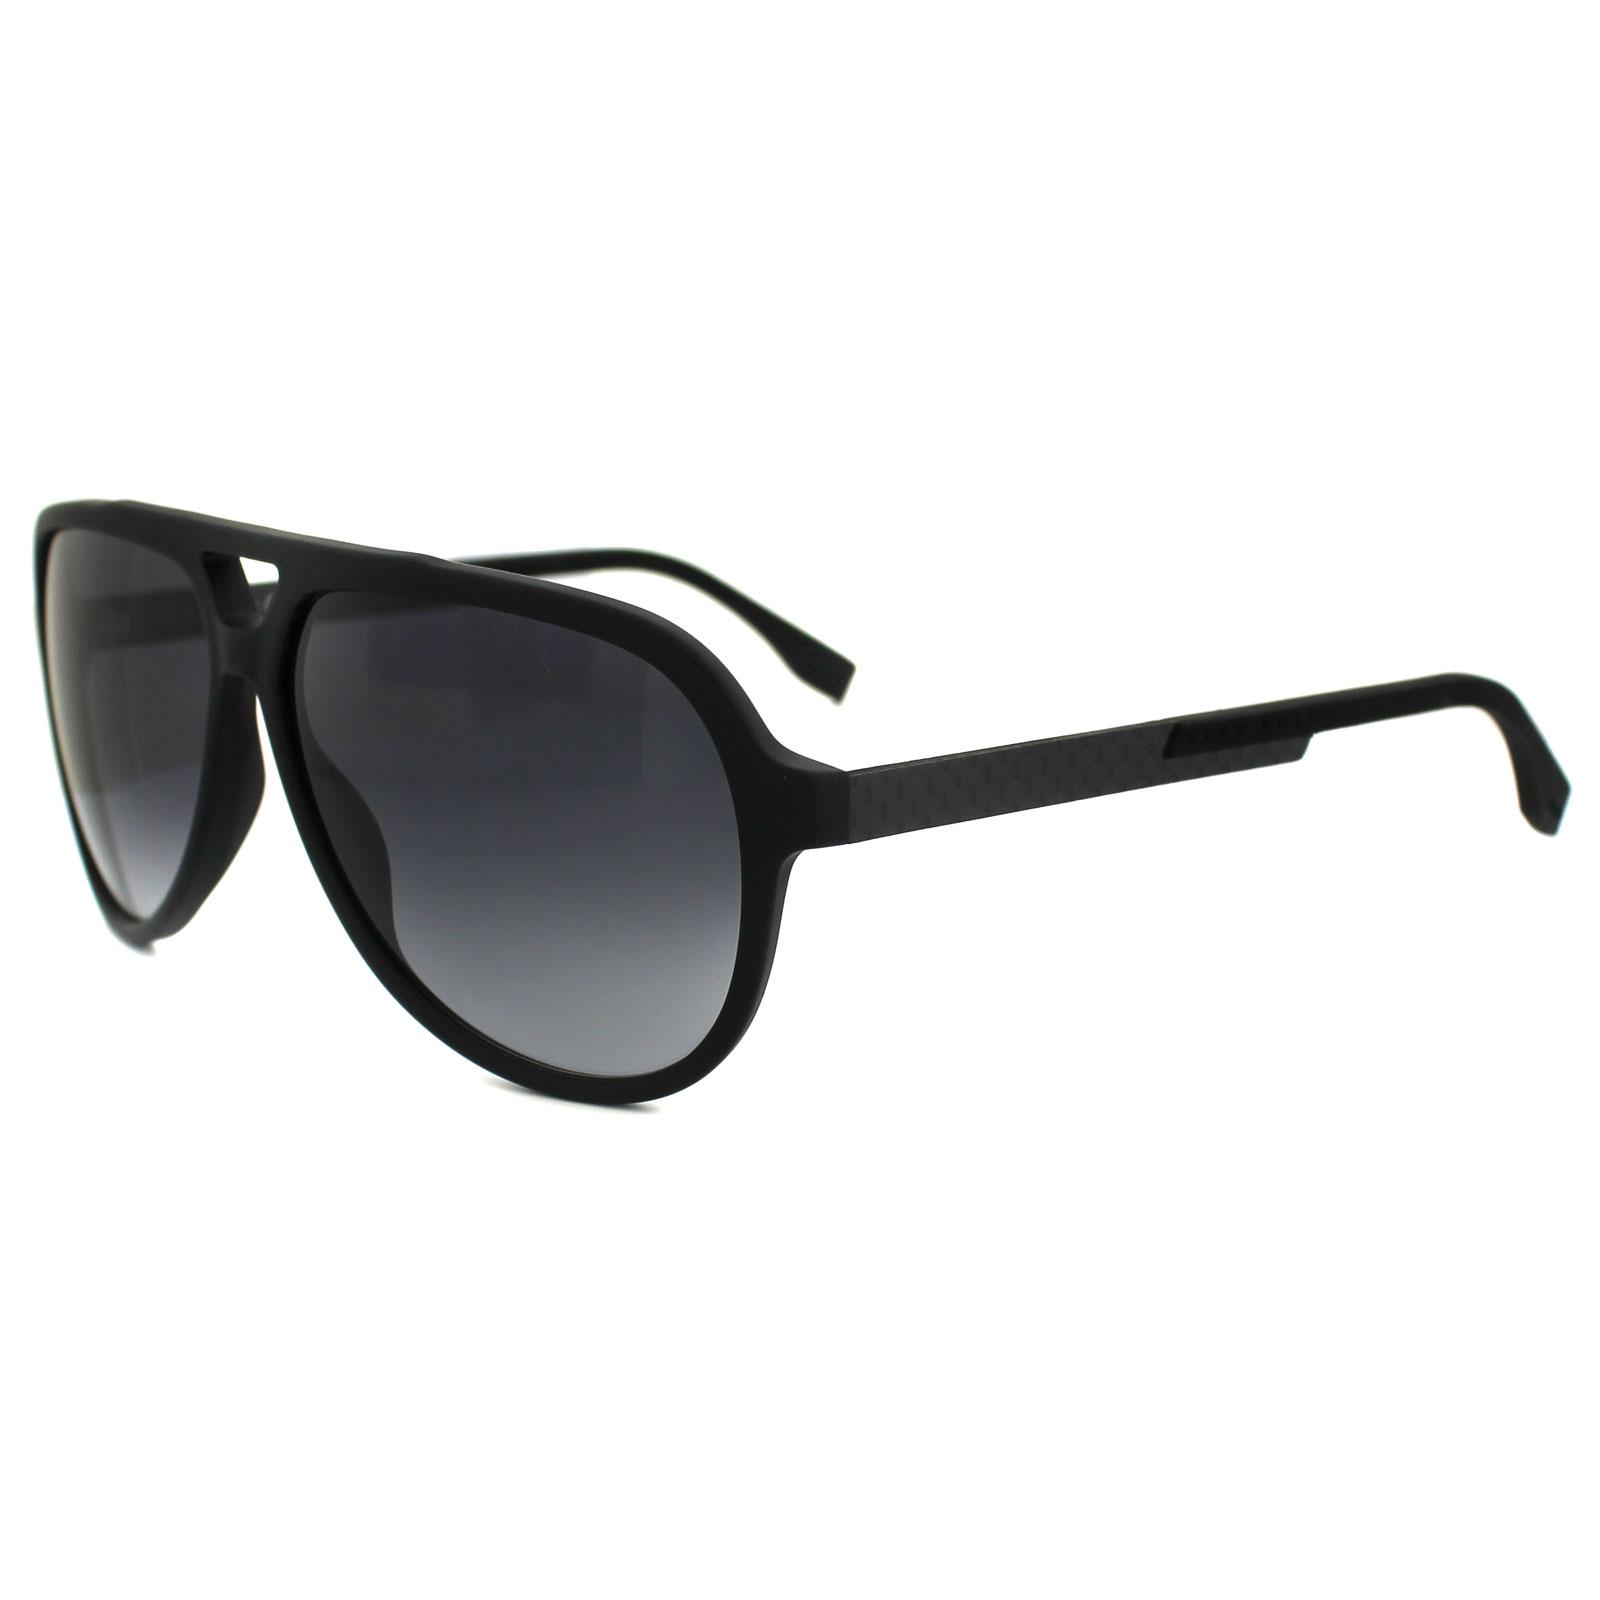 Cheap Hugo Boss 0731 Sunglasses Discounted Sunglasses